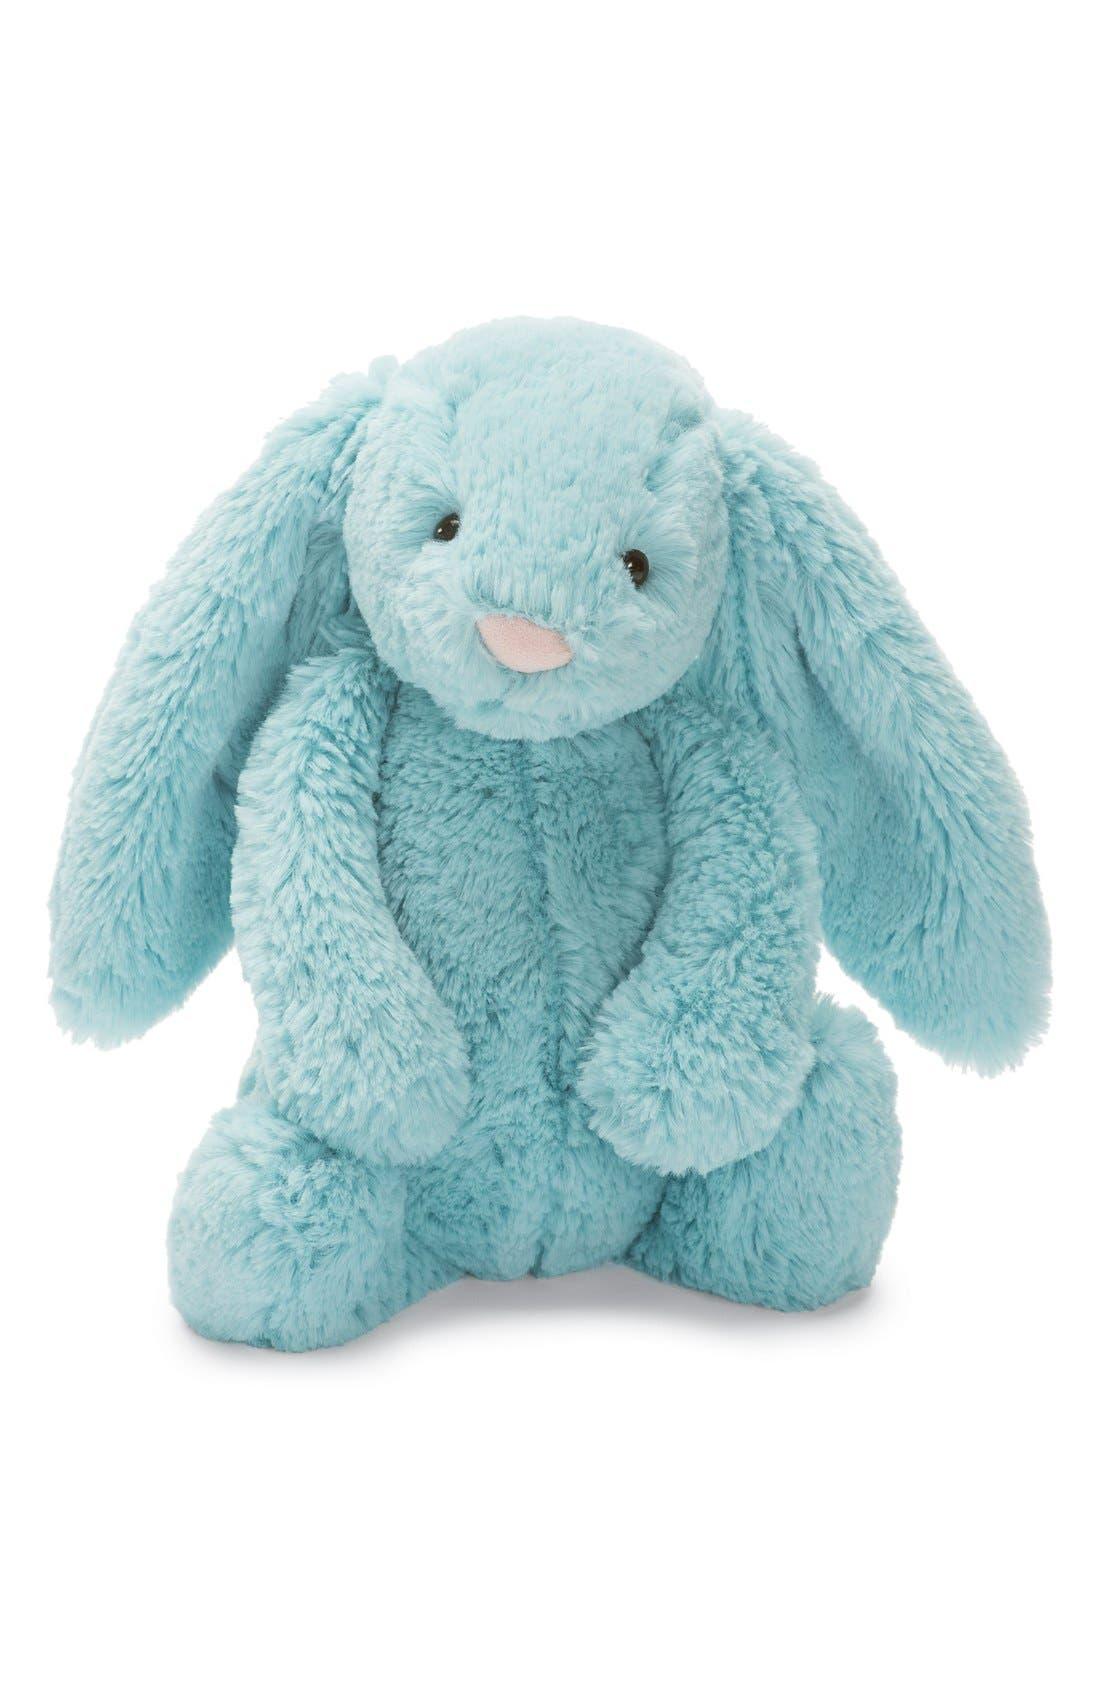 Jellycat 'Bashful Aqua Bunny' Stuffed Animal